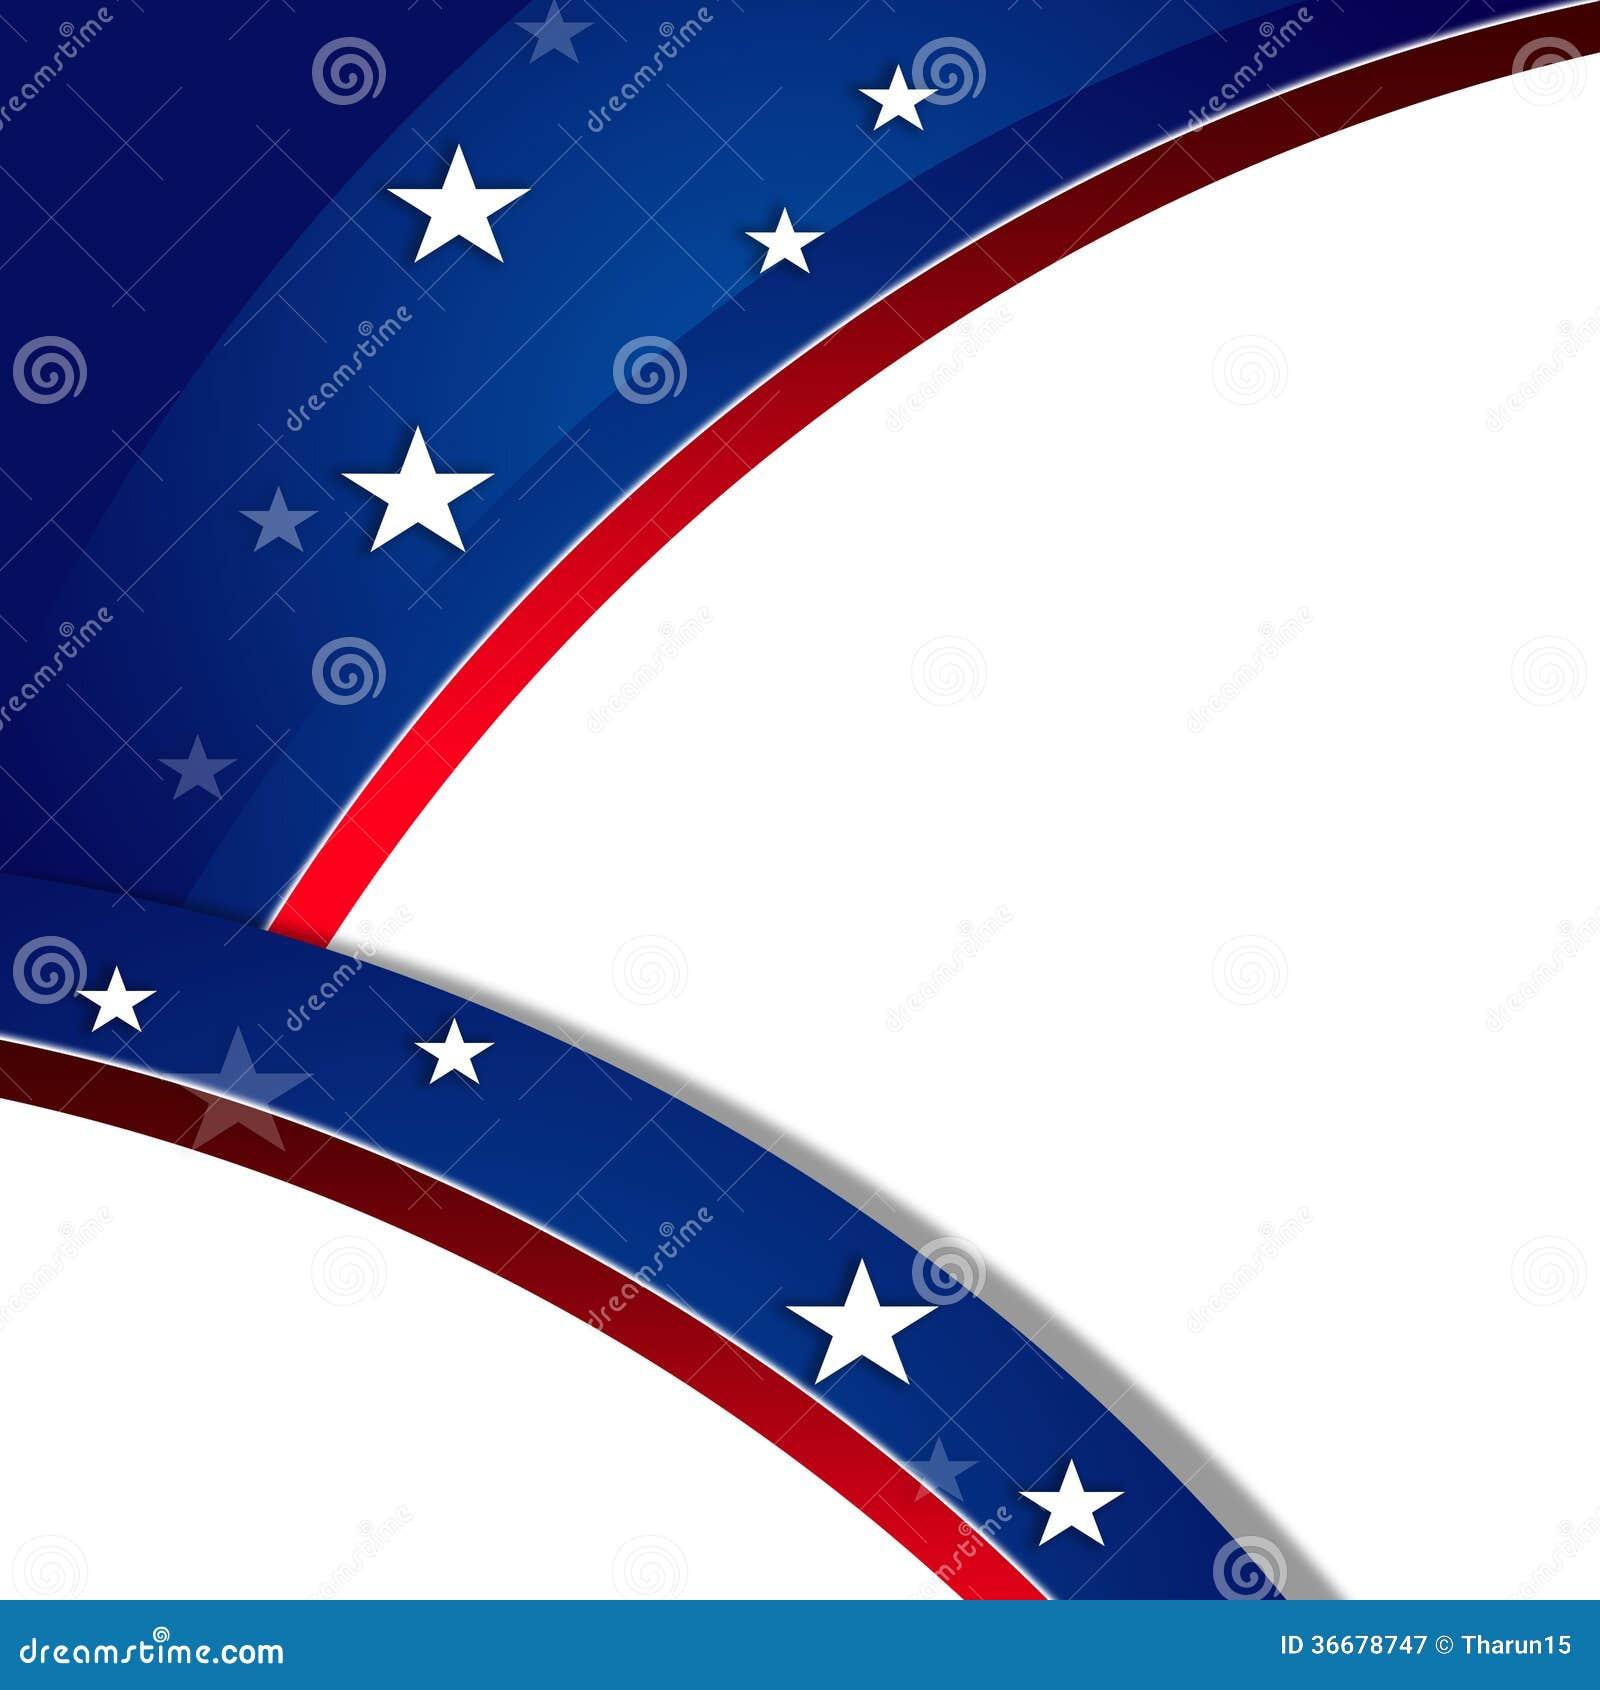 Patriotic Background Mlk Stock Image Image Of Background 36678747